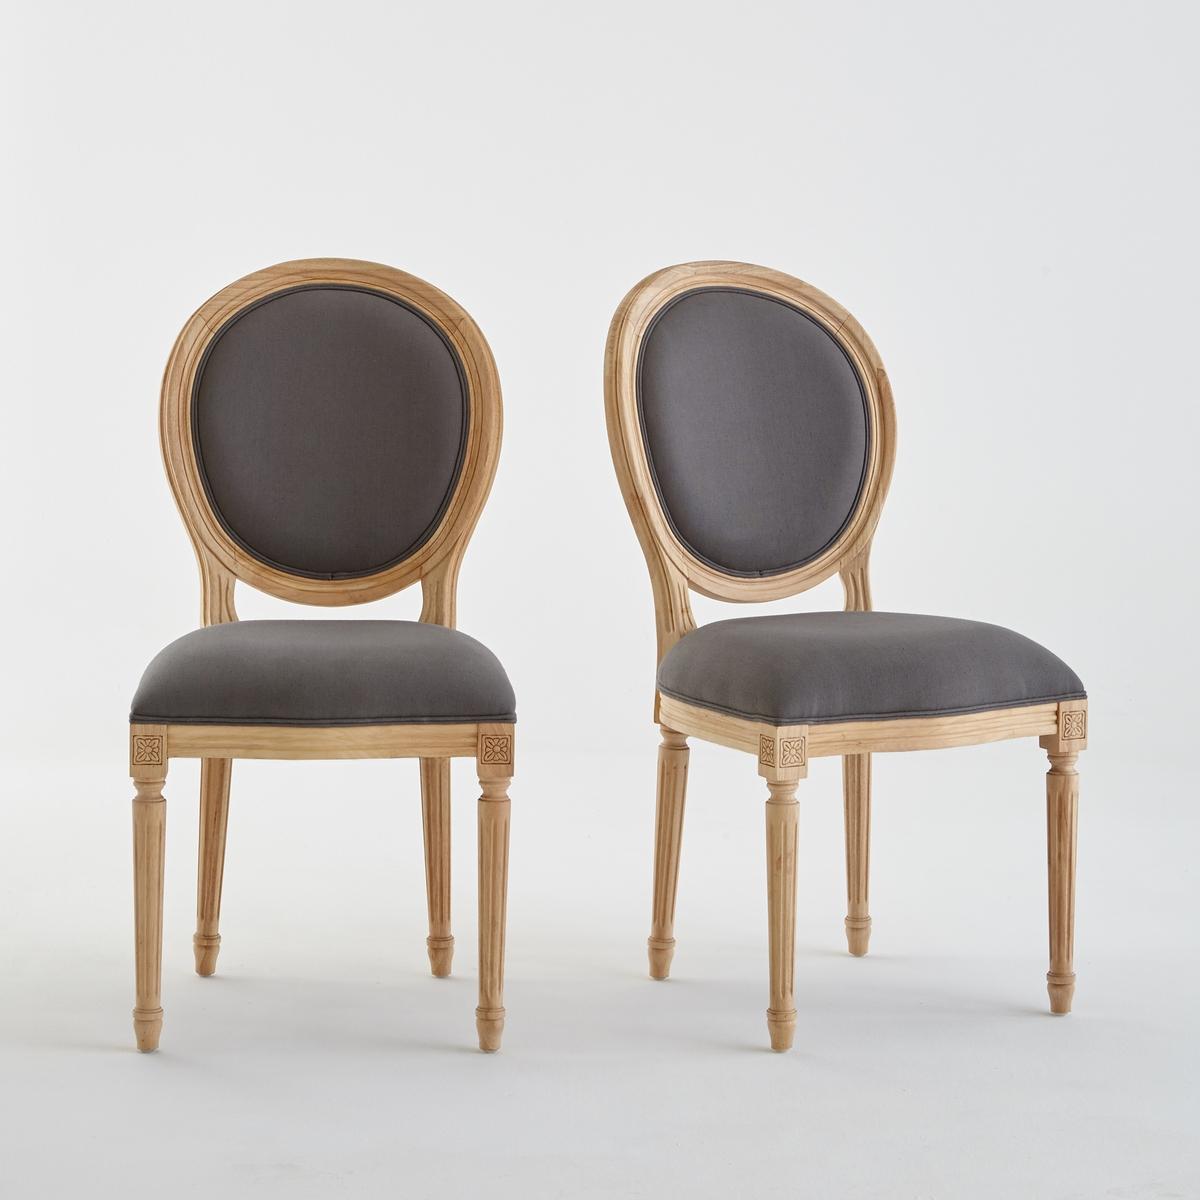 Комплект из 2 стульев Nottingham в стиле Людовика XVI europe the band nottingham